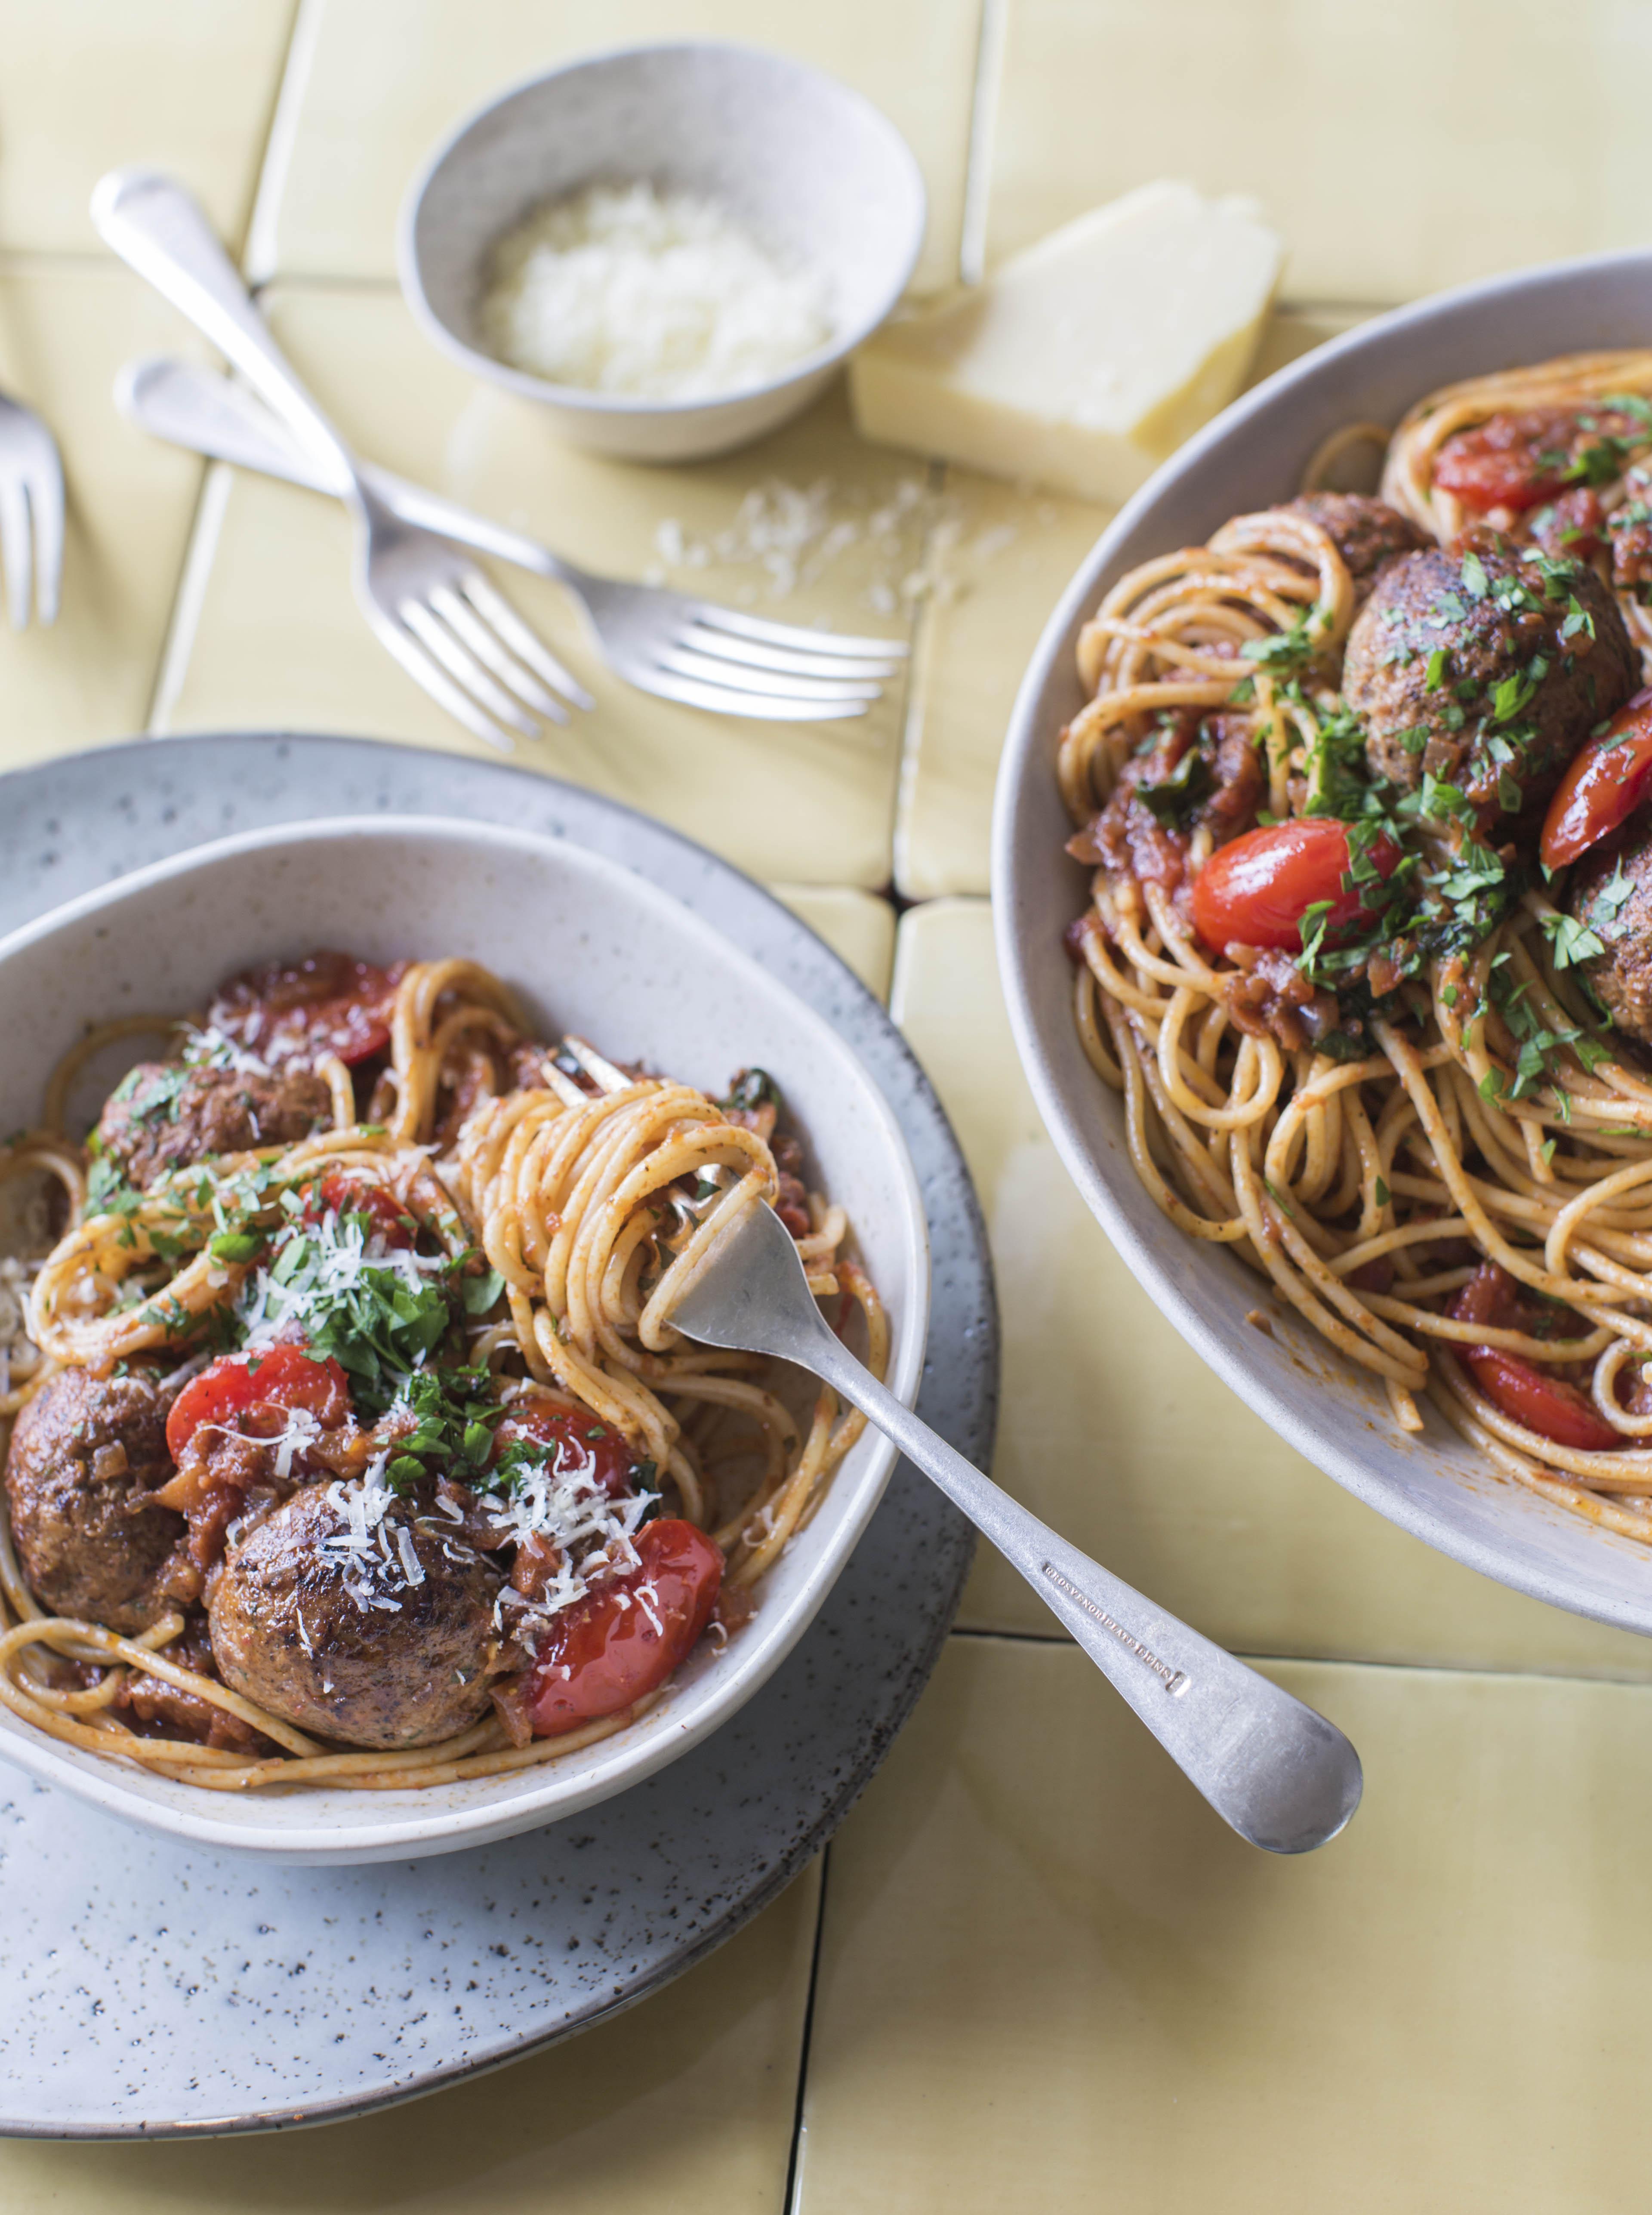 Chelseawinter Co Nz The Best Spaghetti And Meatballs Chelseawinter